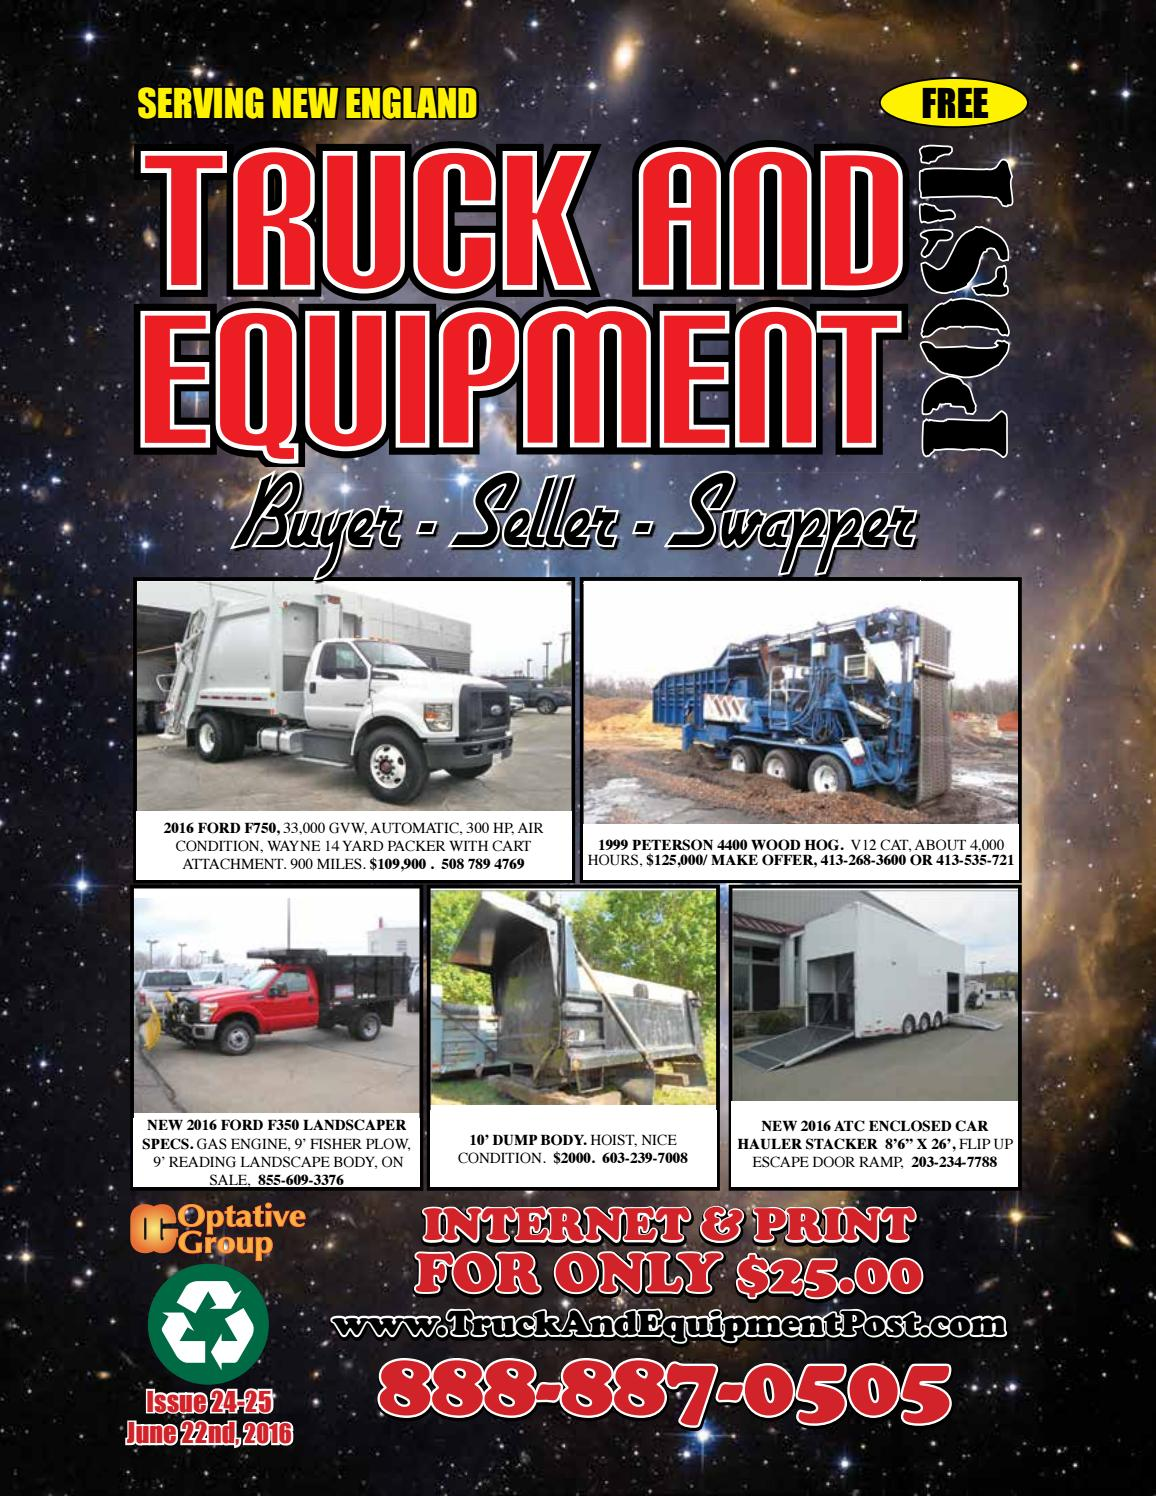 Truck Equipment Post 24 25 2016 By 1clickaway Issuu Pacar W900 Fuse Diagram 2001